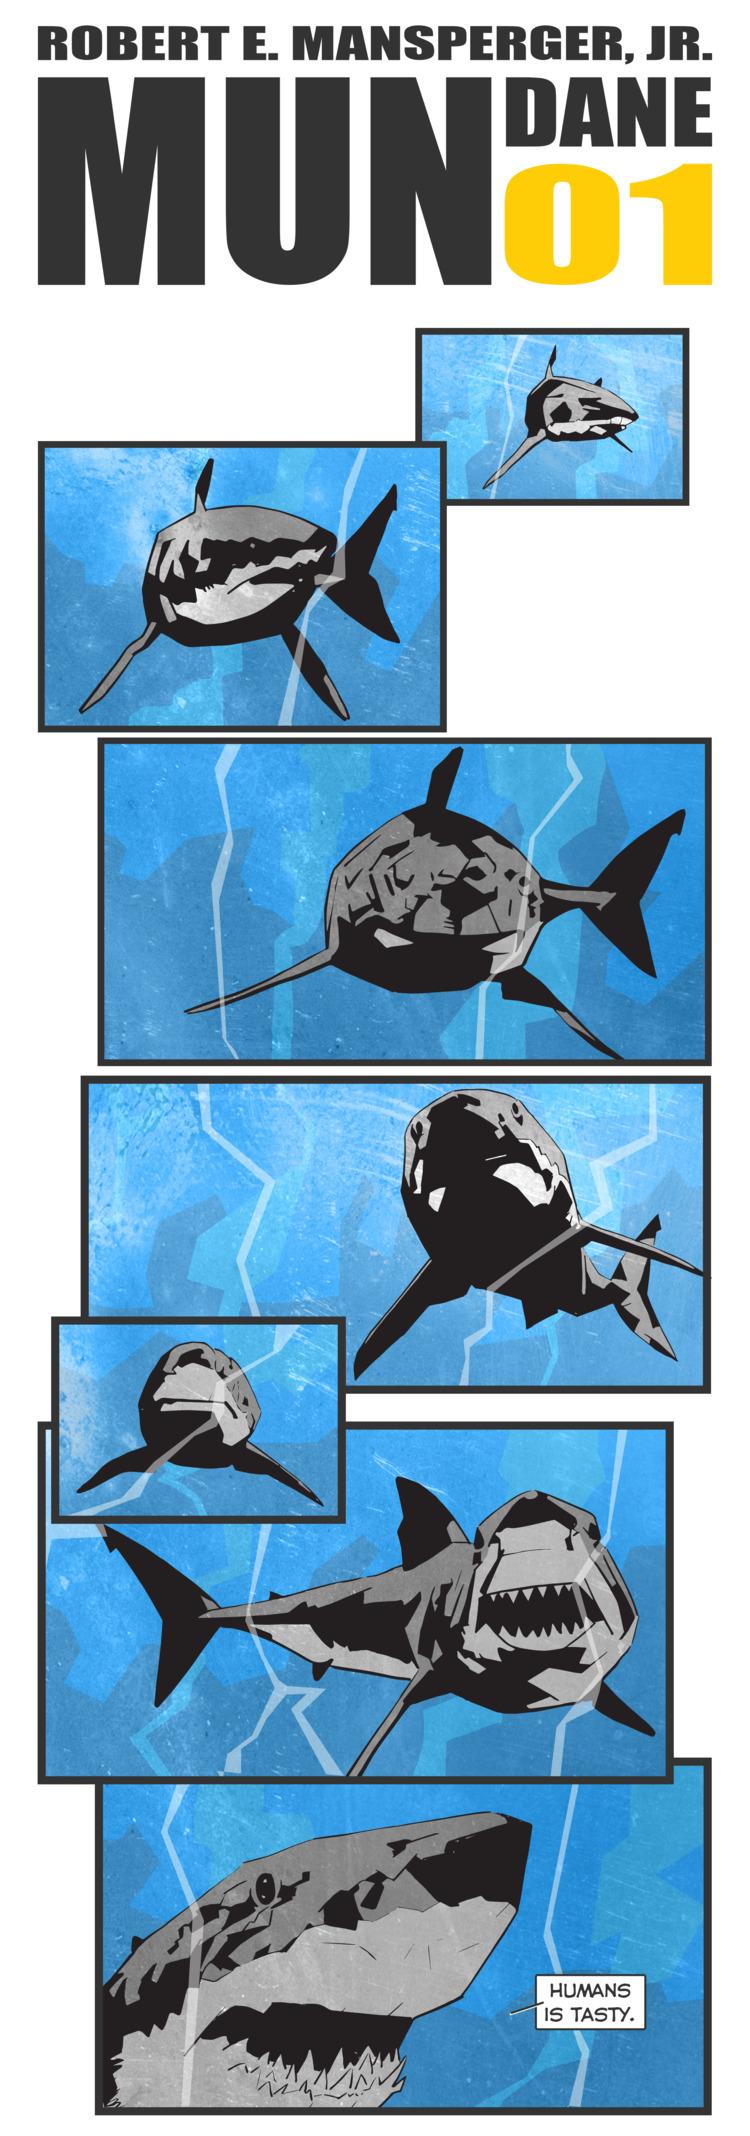 MUNDANE 01 comic strip - rmansperger | ello